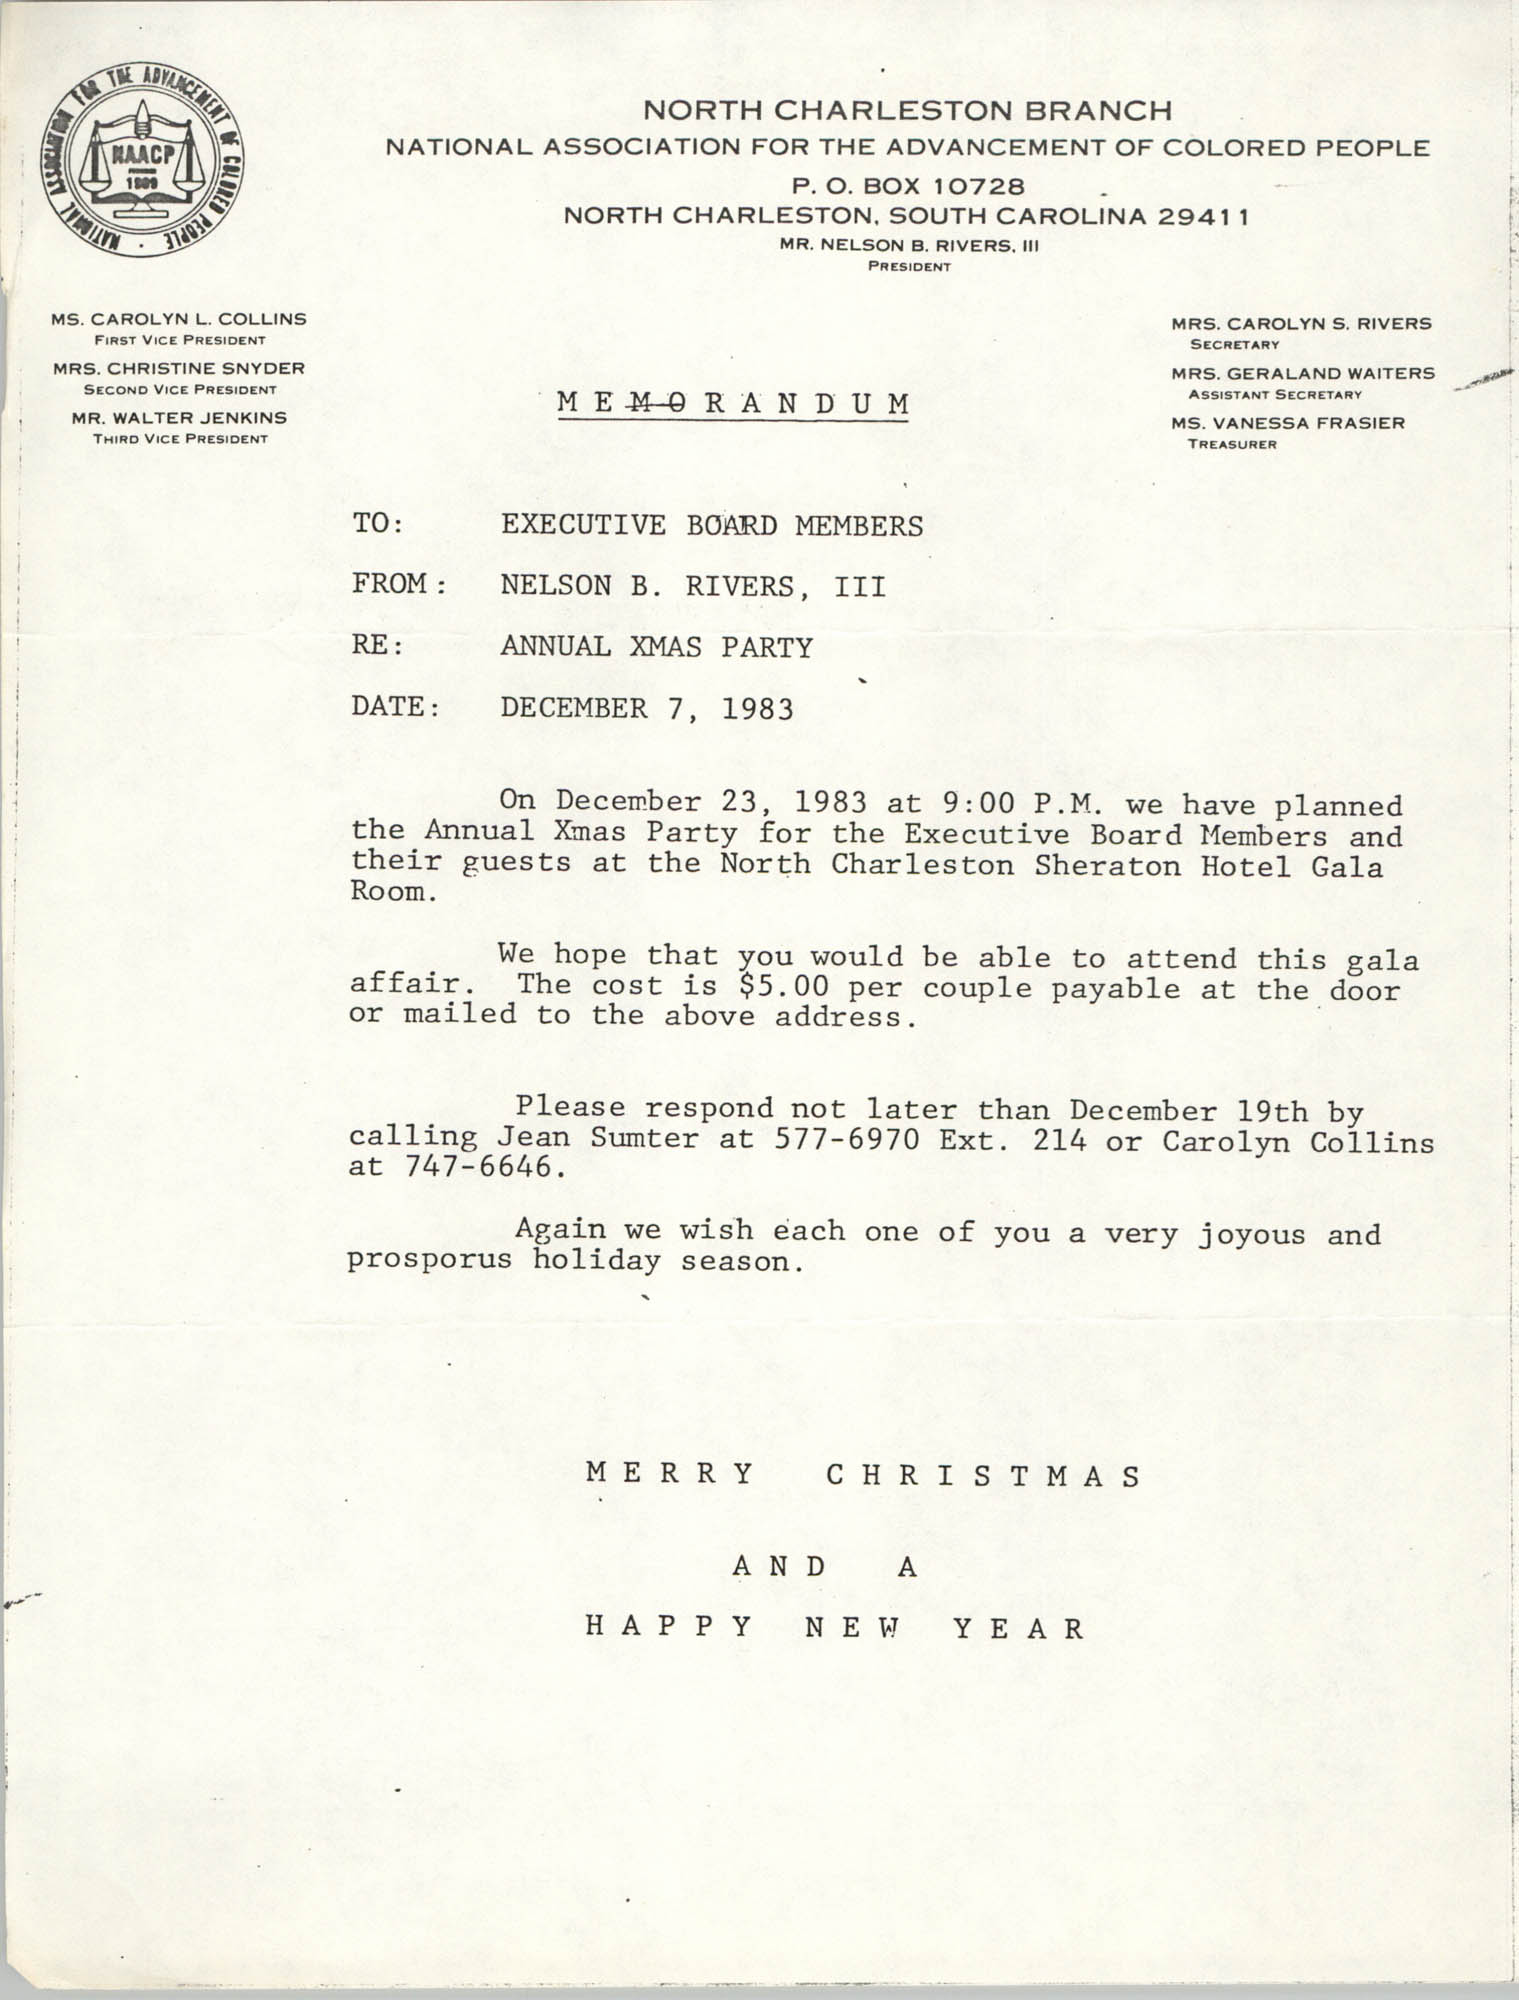 North Charleston Branch of the NAACP Memorandum, December 7, 1983